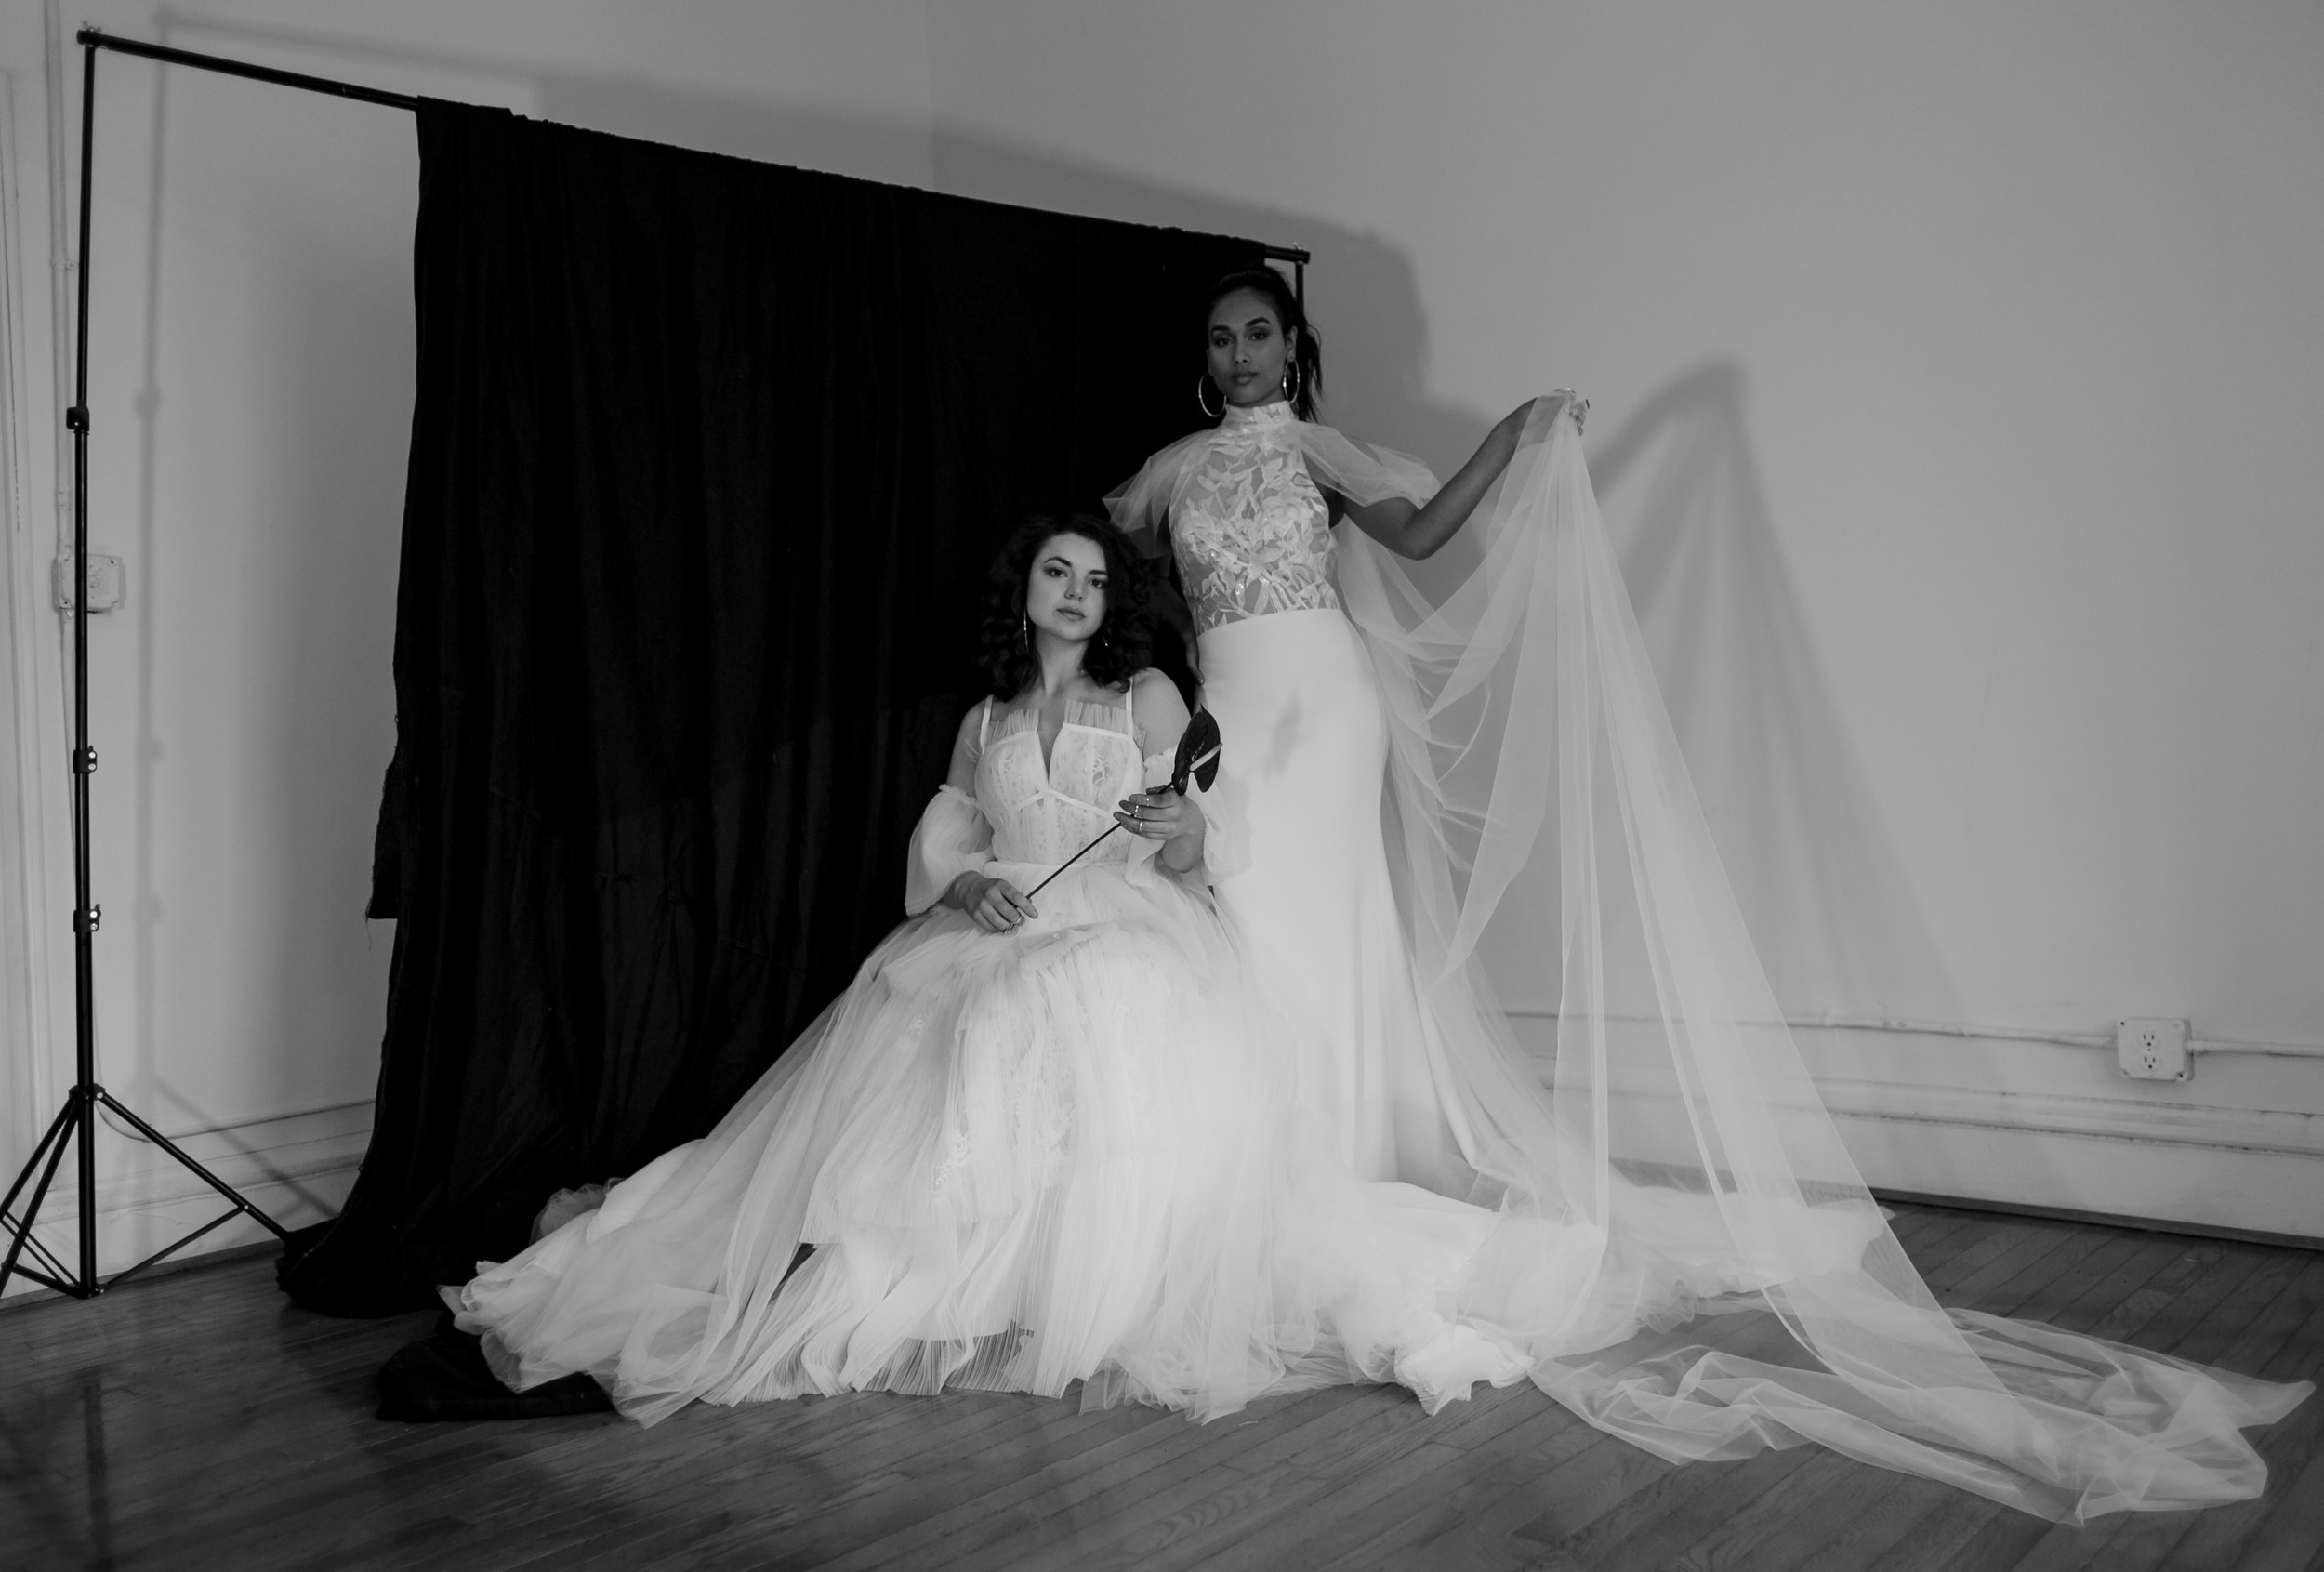 Chicago-Bride-Wedding-Dress-Varca-Edited-445.jpg